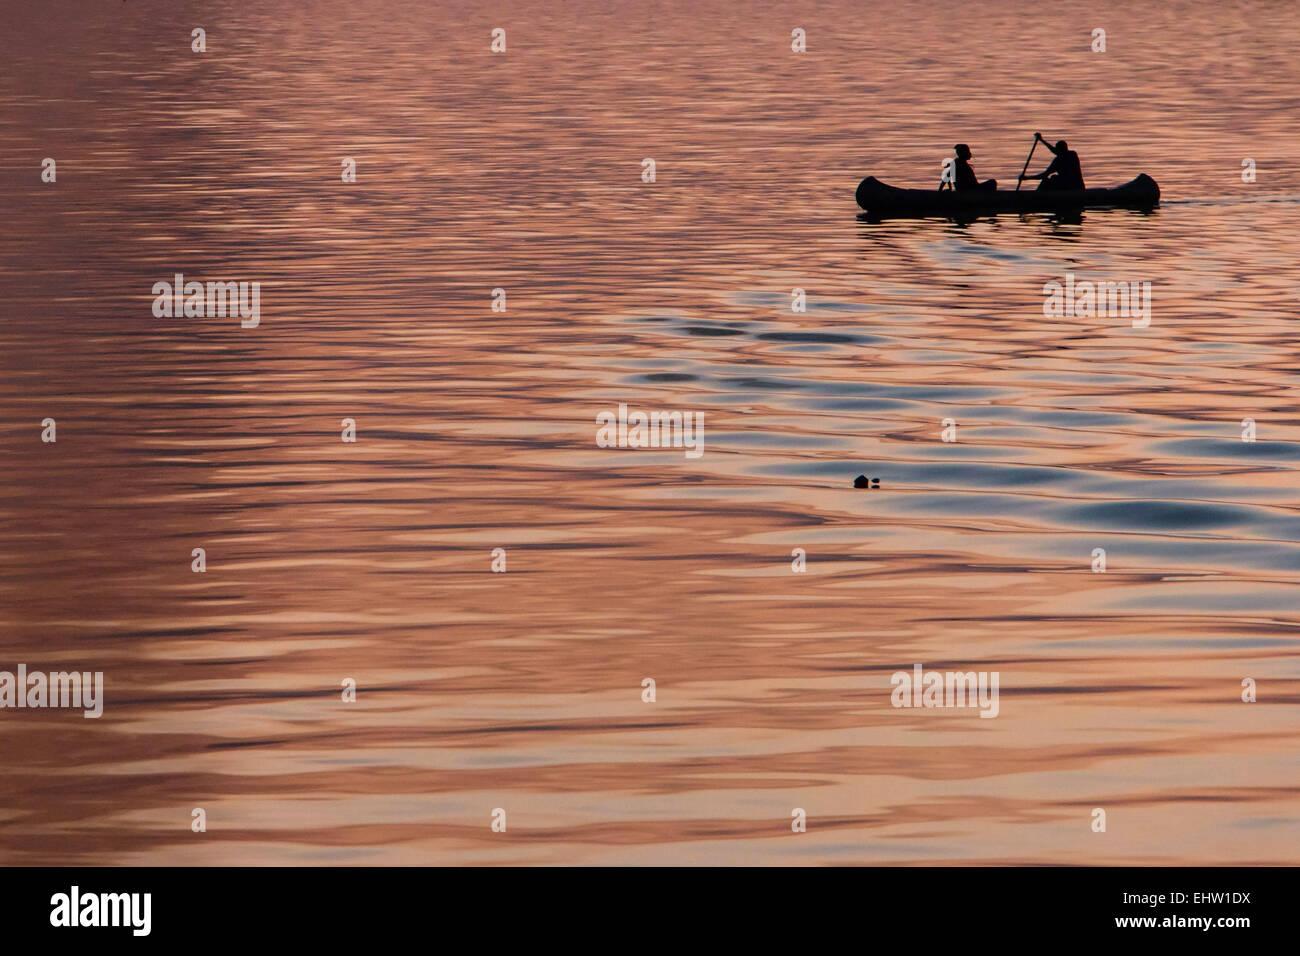 ILLUSTRATION OF SENEGAL, WEST AFRICA - Stock Image